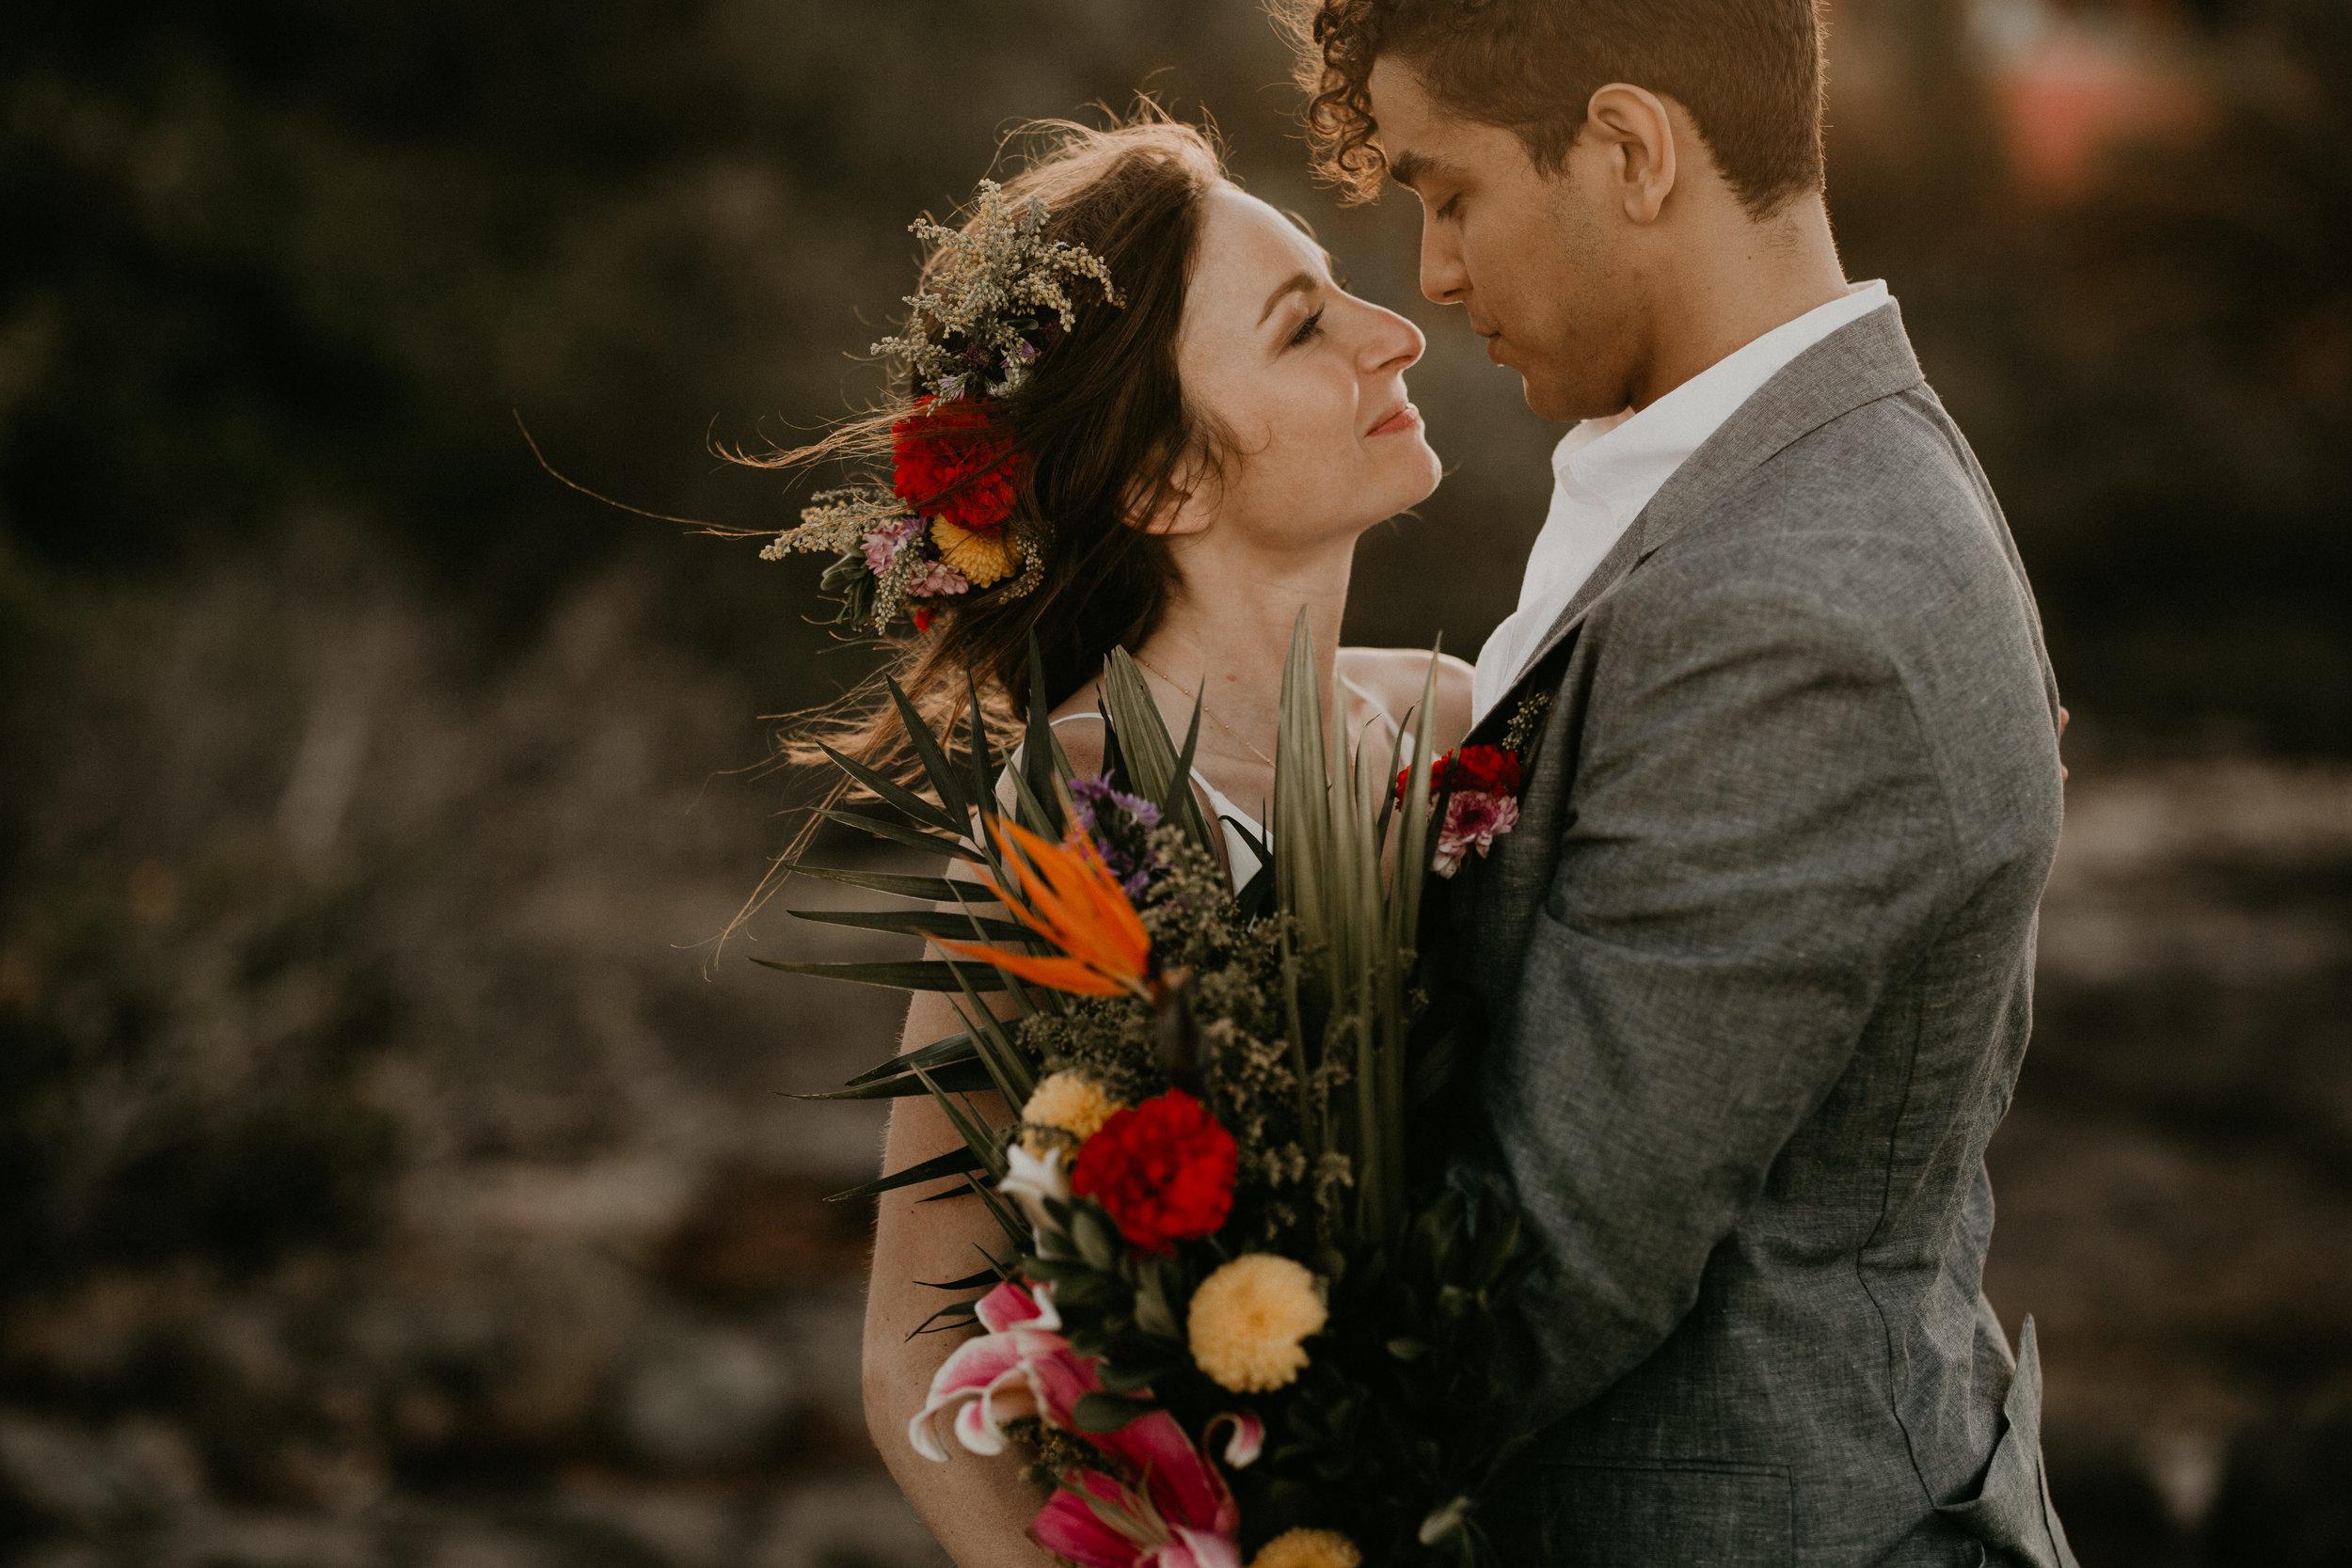 Nicole-Daacke-Photography-beachfront-akumal-destionation-wedding-tulum-mexico-elopement-photographer-destination-wedding-inspiration-sunset-champagne-pop-boho-bride-ocean-tropical-bohemian-tulum-wedding-photos-189.jpg